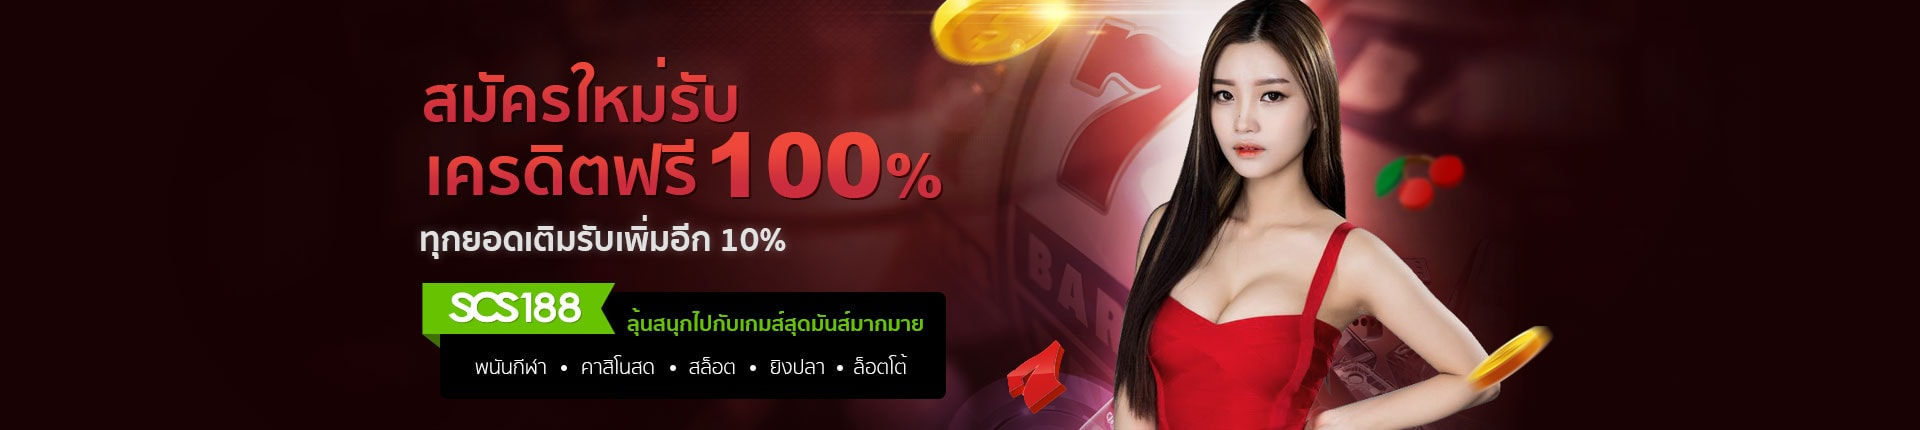 gclub casino โบนัสฟรี 100